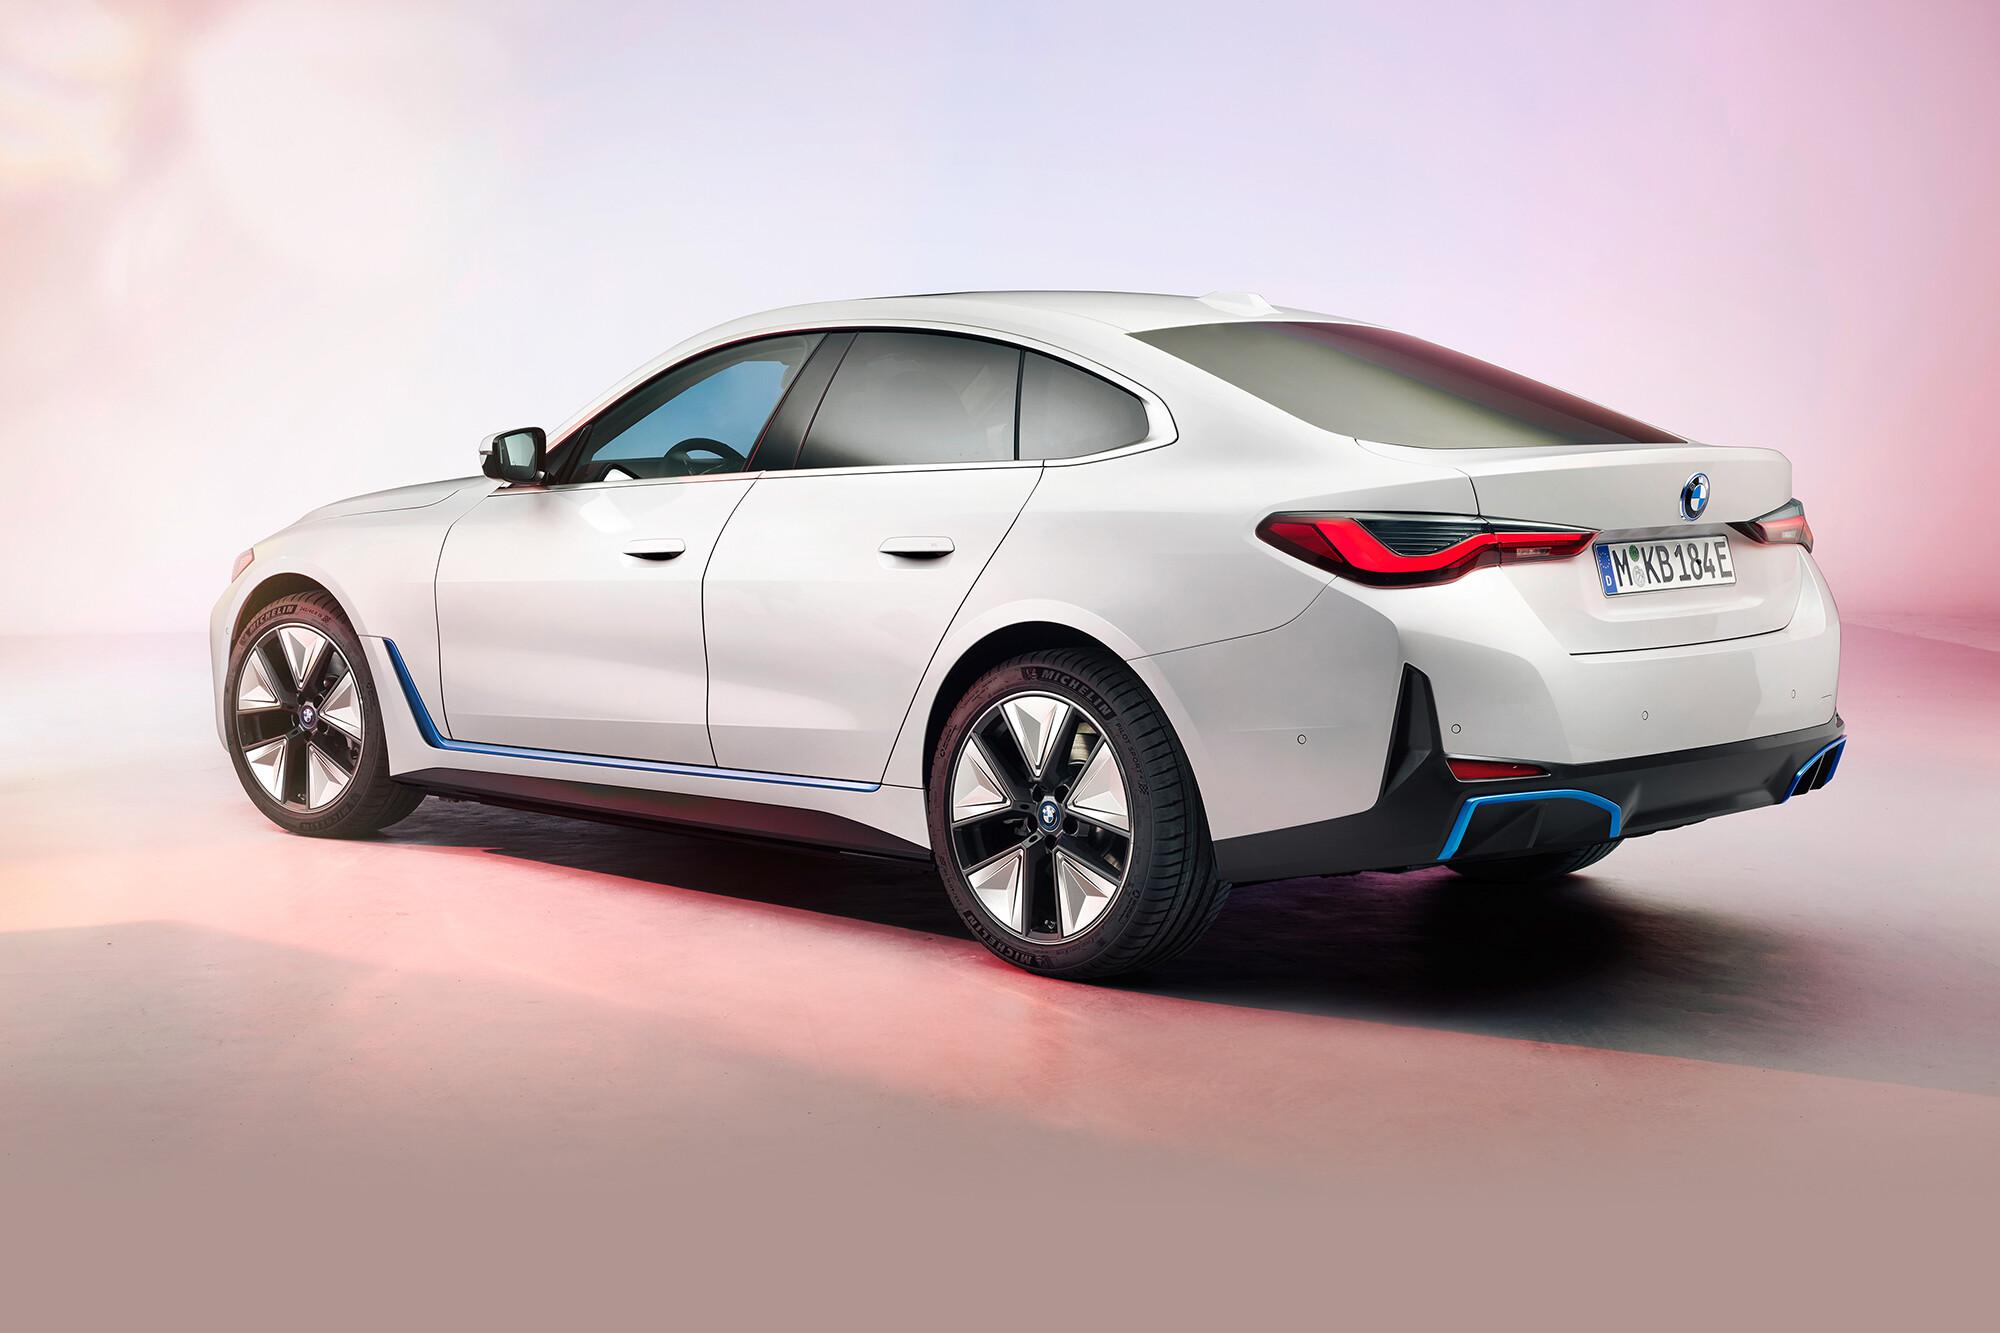 2022 Bmw I 4 Electric Car Revealed 3 Jpg